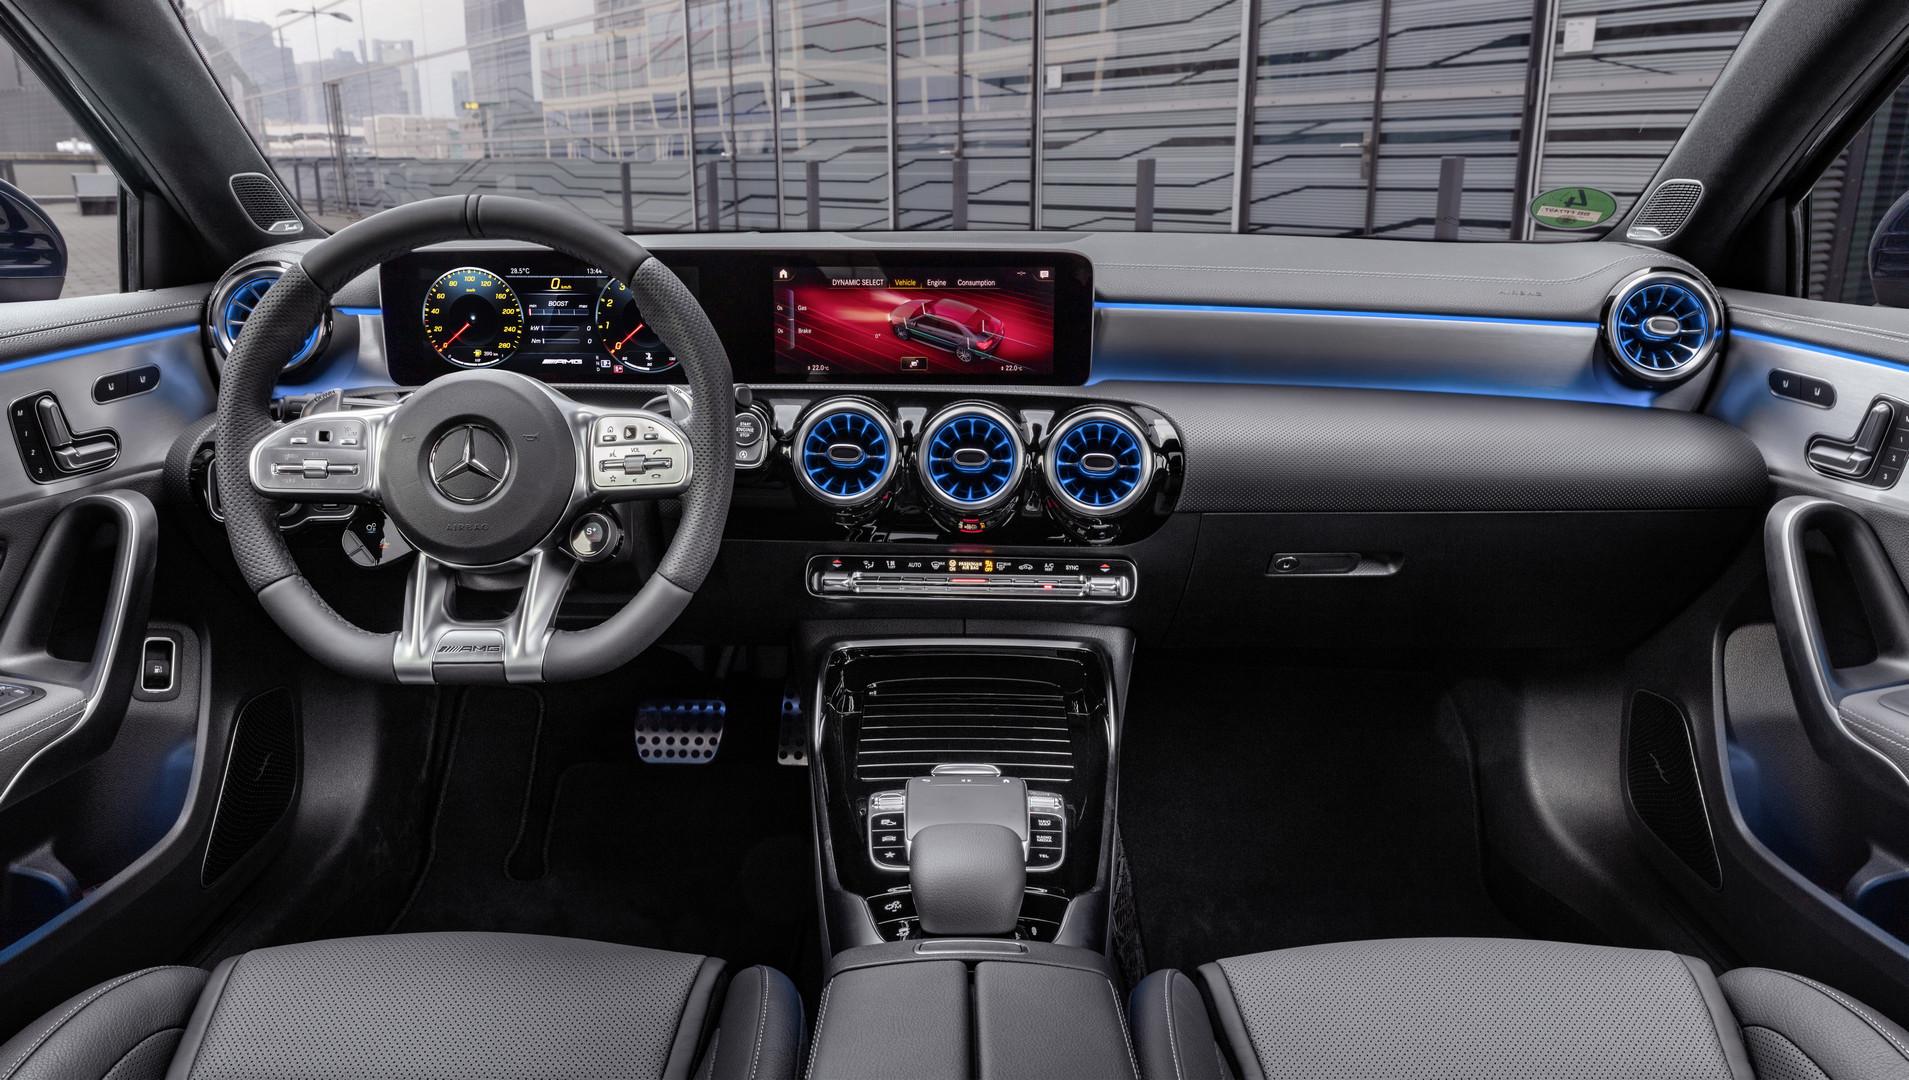 Mercedes-AMG A 35 4MATIC Limousine // Mercedes-AMG A 35 4MATIC